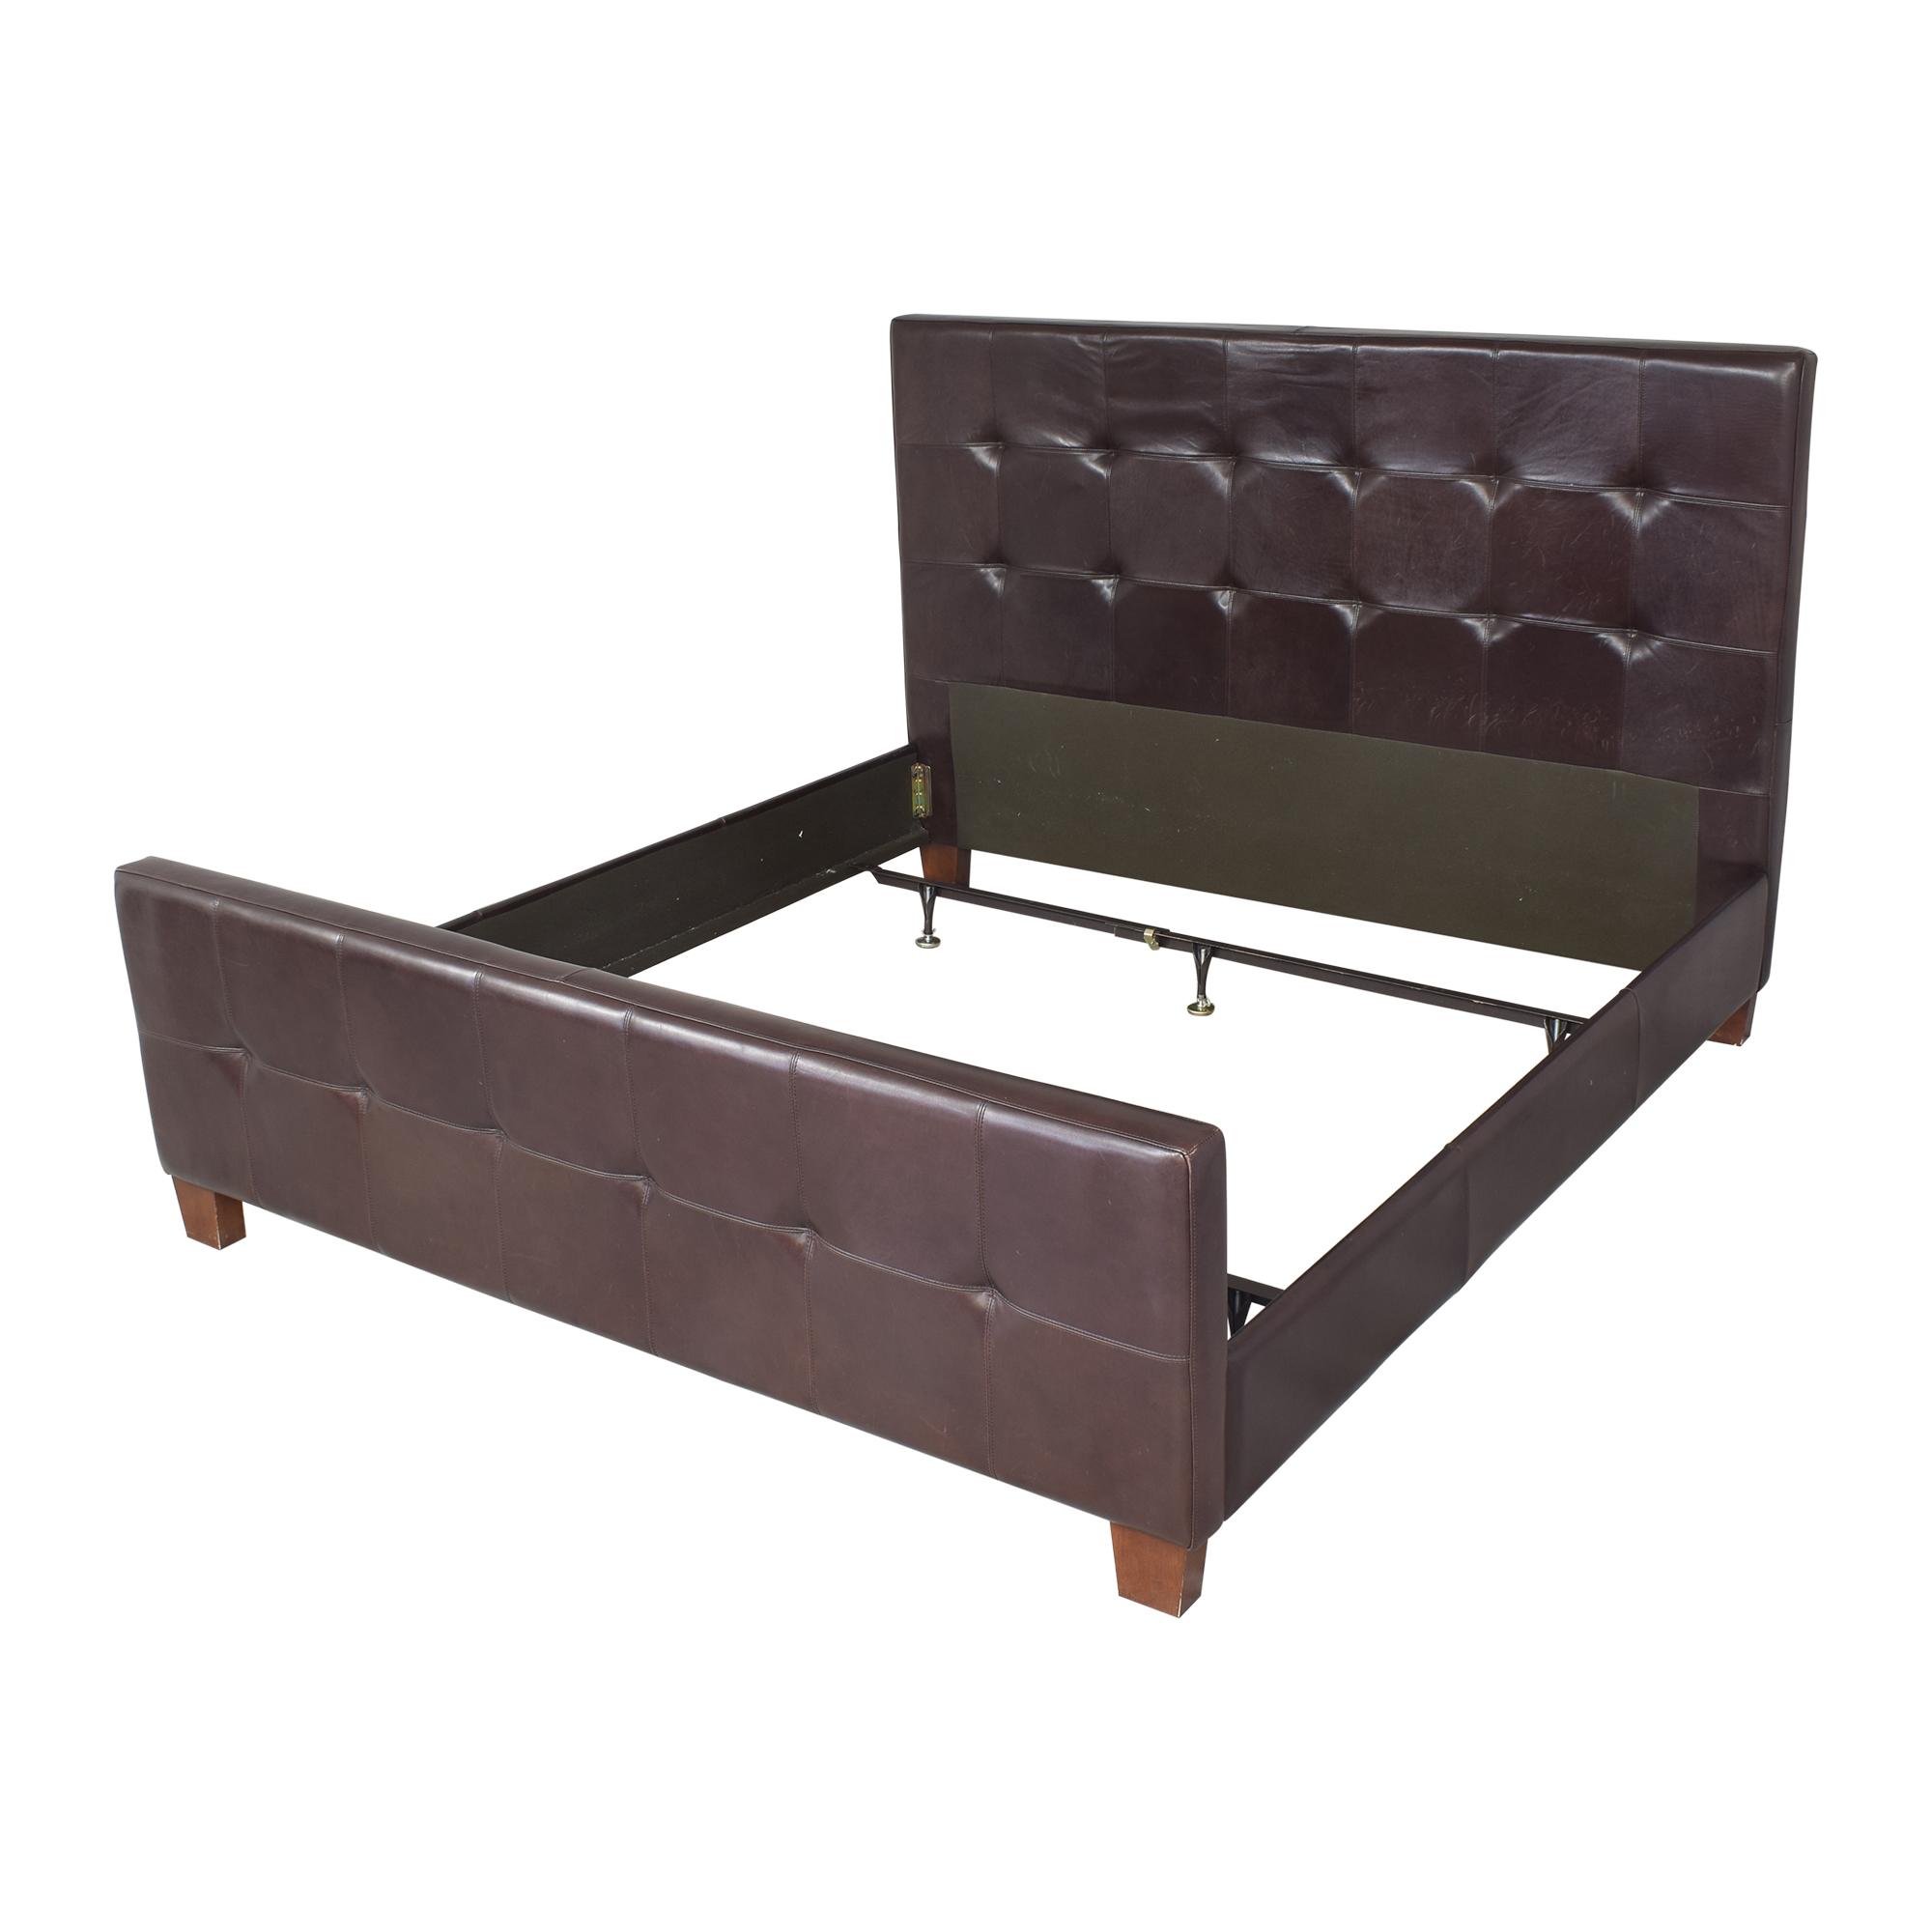 buy Crate & Barrel Tufted King Bed Crate & Barrel Beds